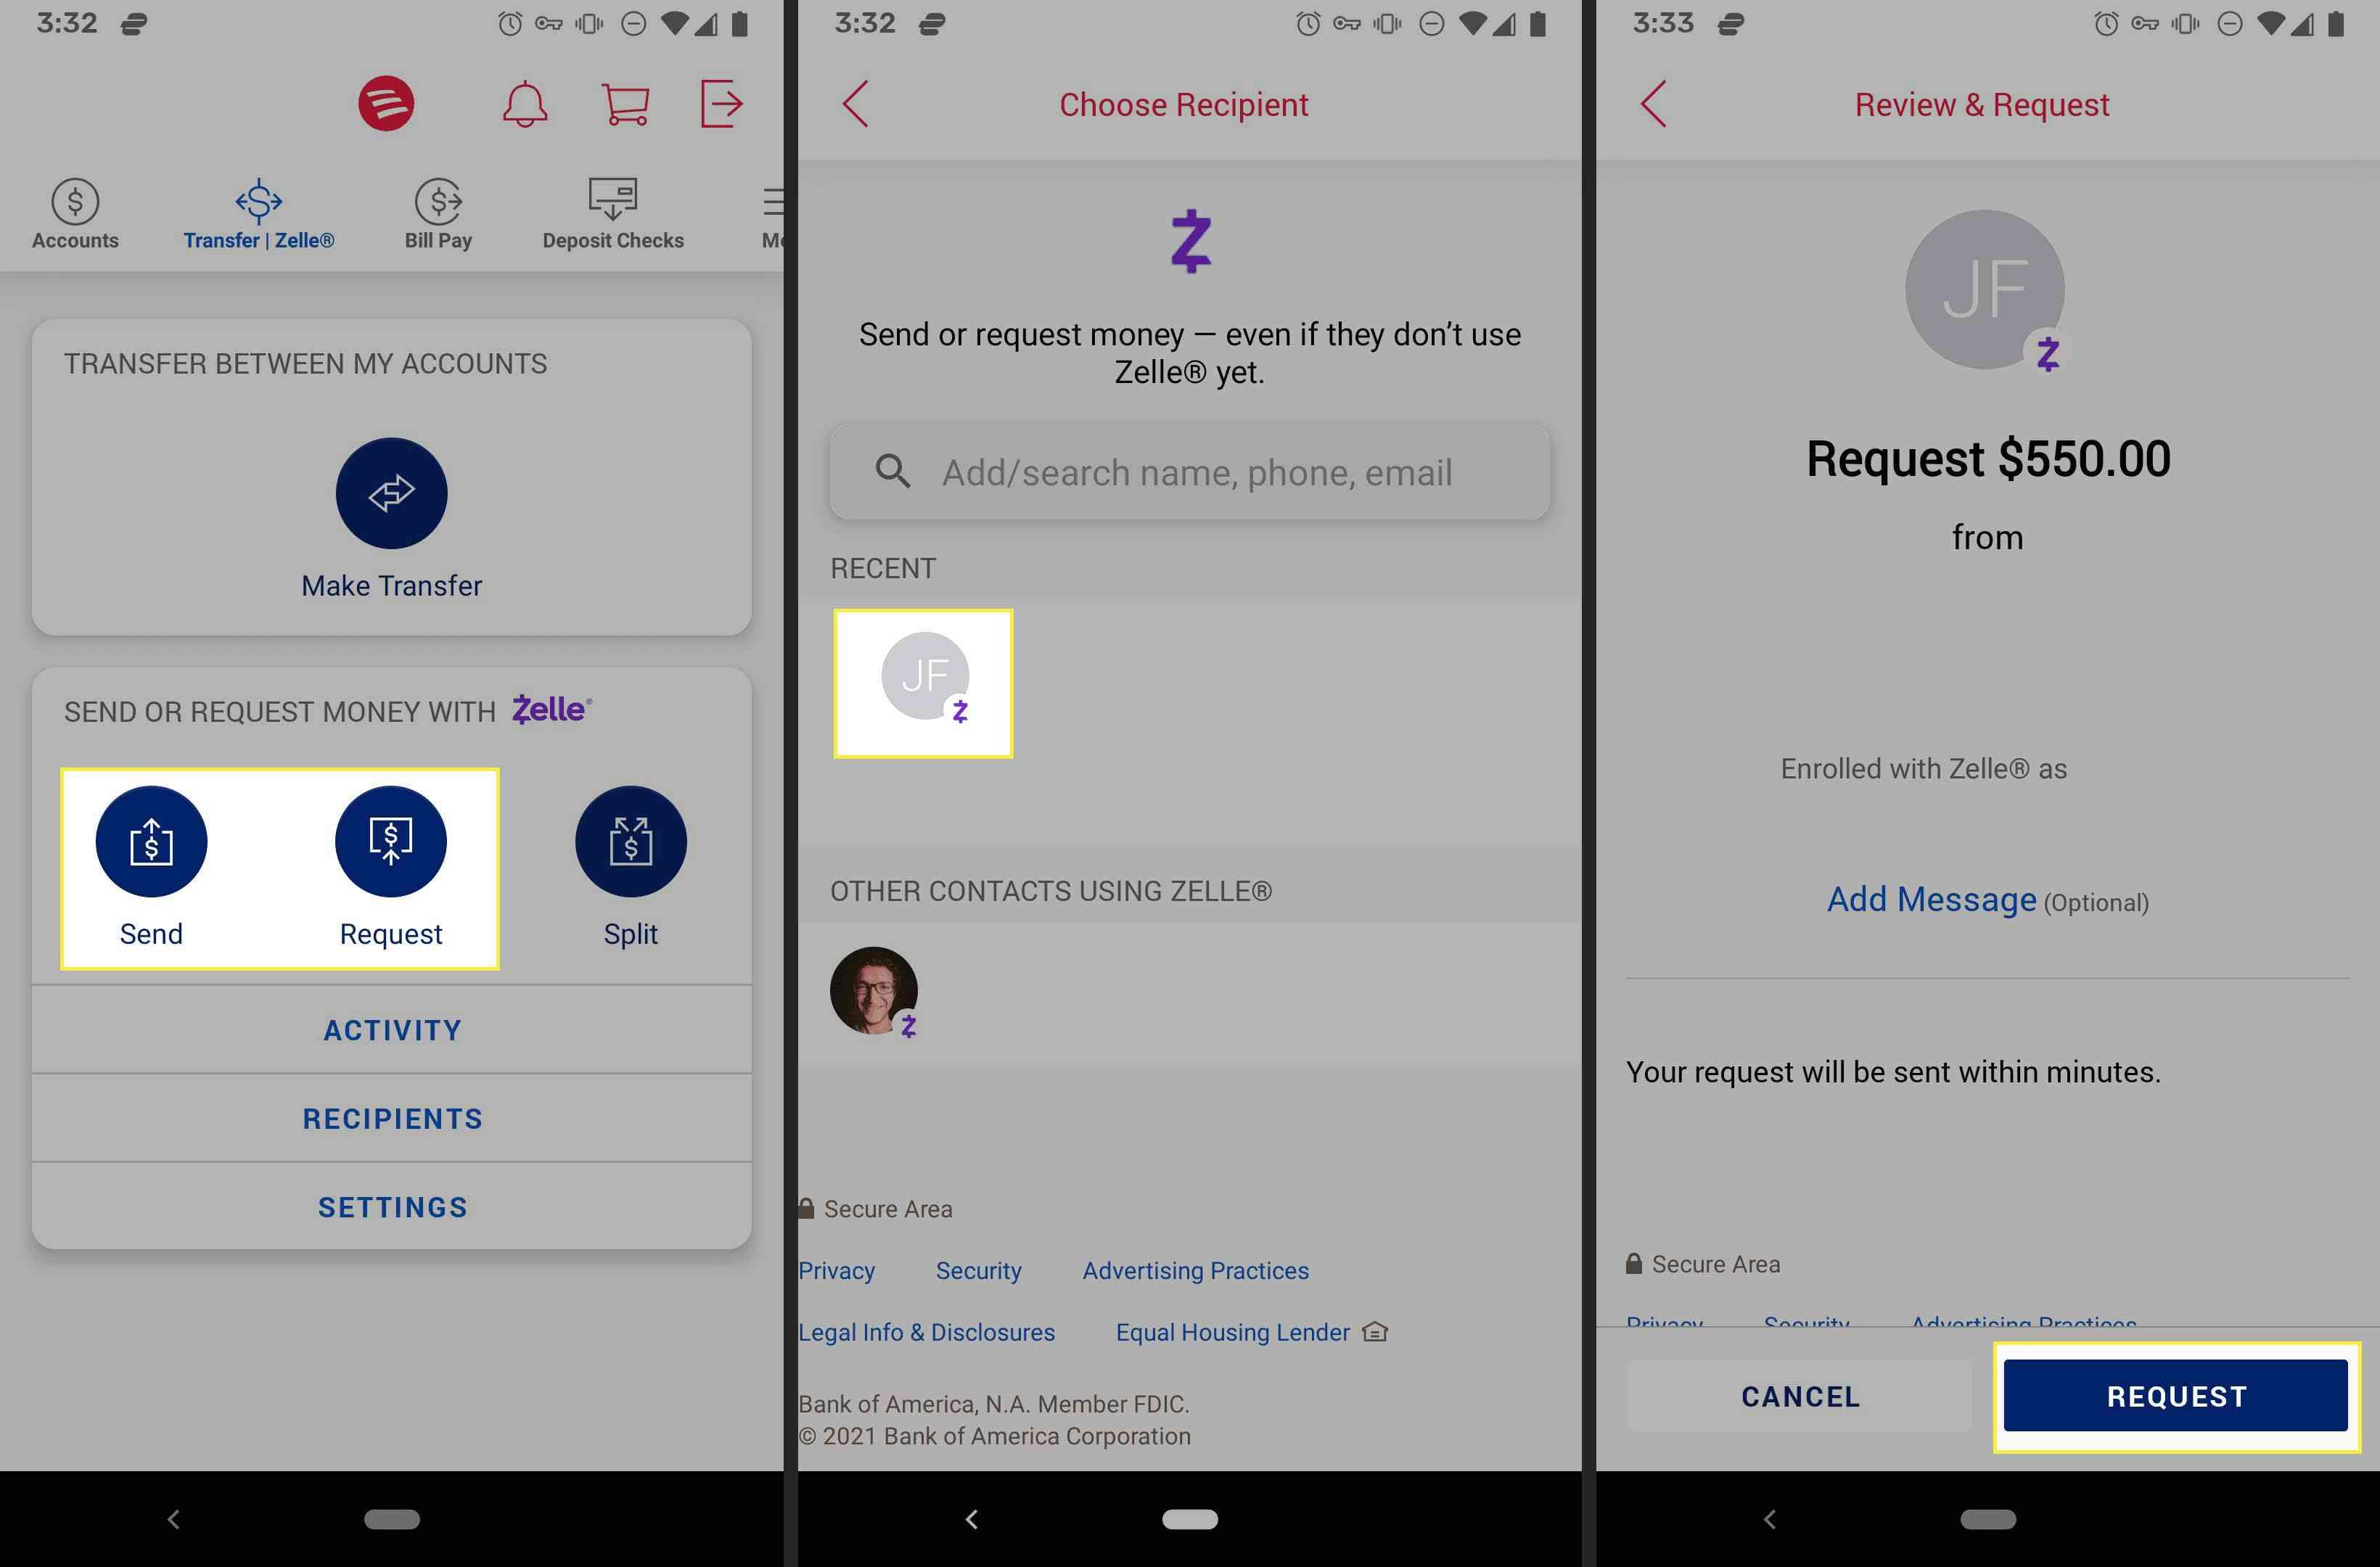 Requesting money over Zelle through Bank of America's app